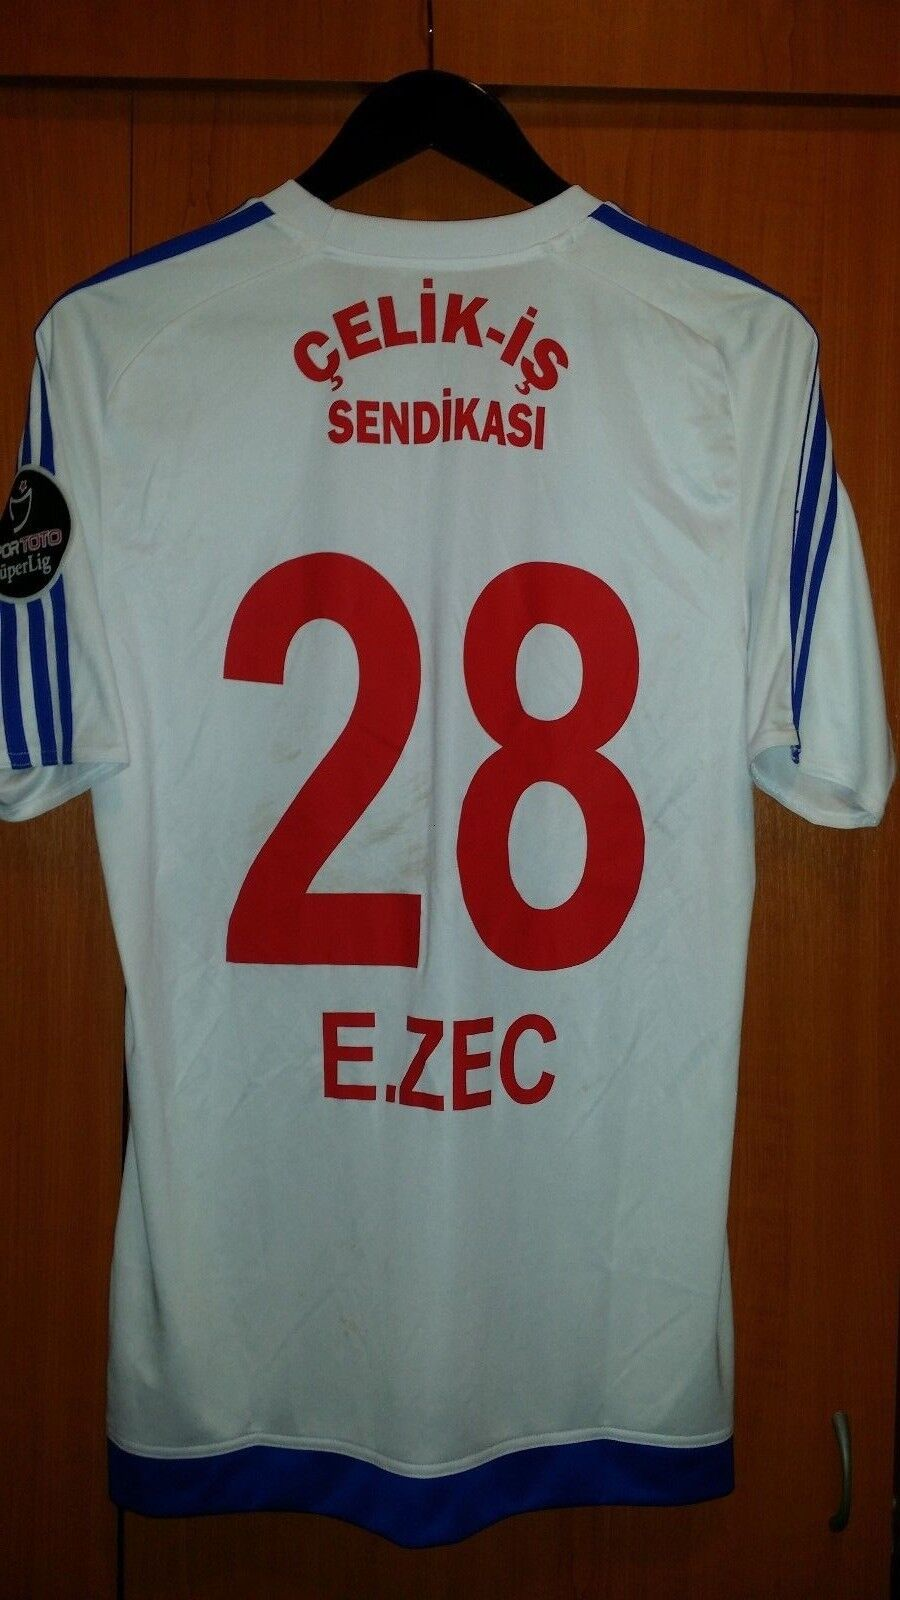 Trikot Trikot Trikot Fußball Karabukspor FC Ermin Zec adidas 2017 M Weiß    Angenehmes Aussehen  7f1bff